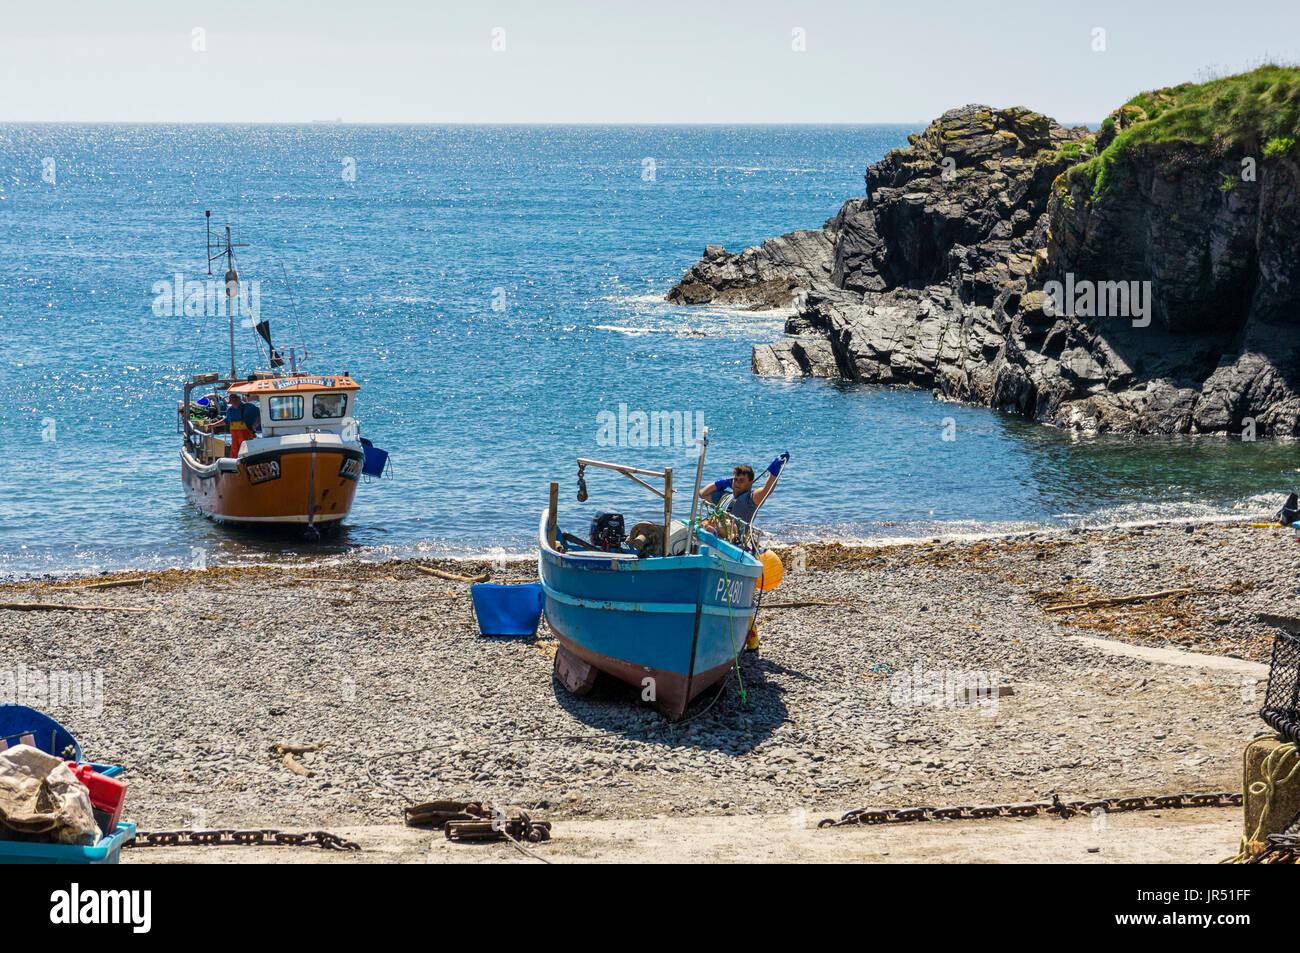 Fisherman and fishing boats at Cadgwith Cove, Lizard Peninsula, Cornwall, UK - Stock Image